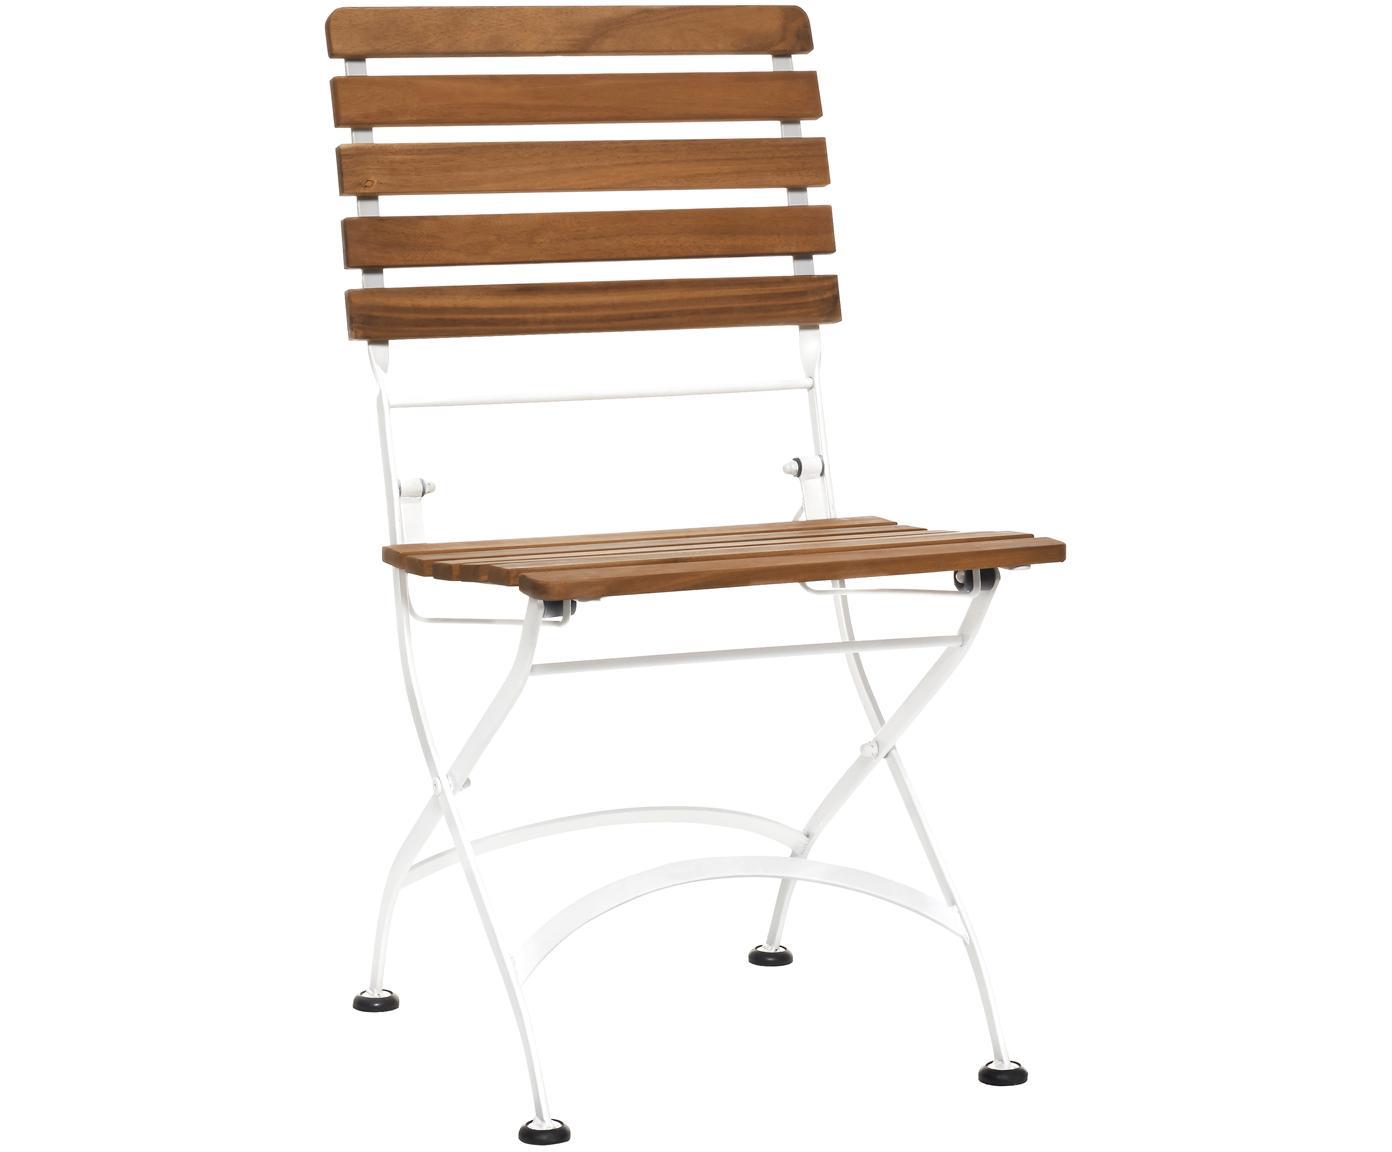 Garten-Klappstühle Parklife, 2 Stück, Sitzfläche: Akazienholz, geölt, Gestell: Metall, verzinkt, pulverb, Weiss, Akazienholz, B 47 x T 59 cm